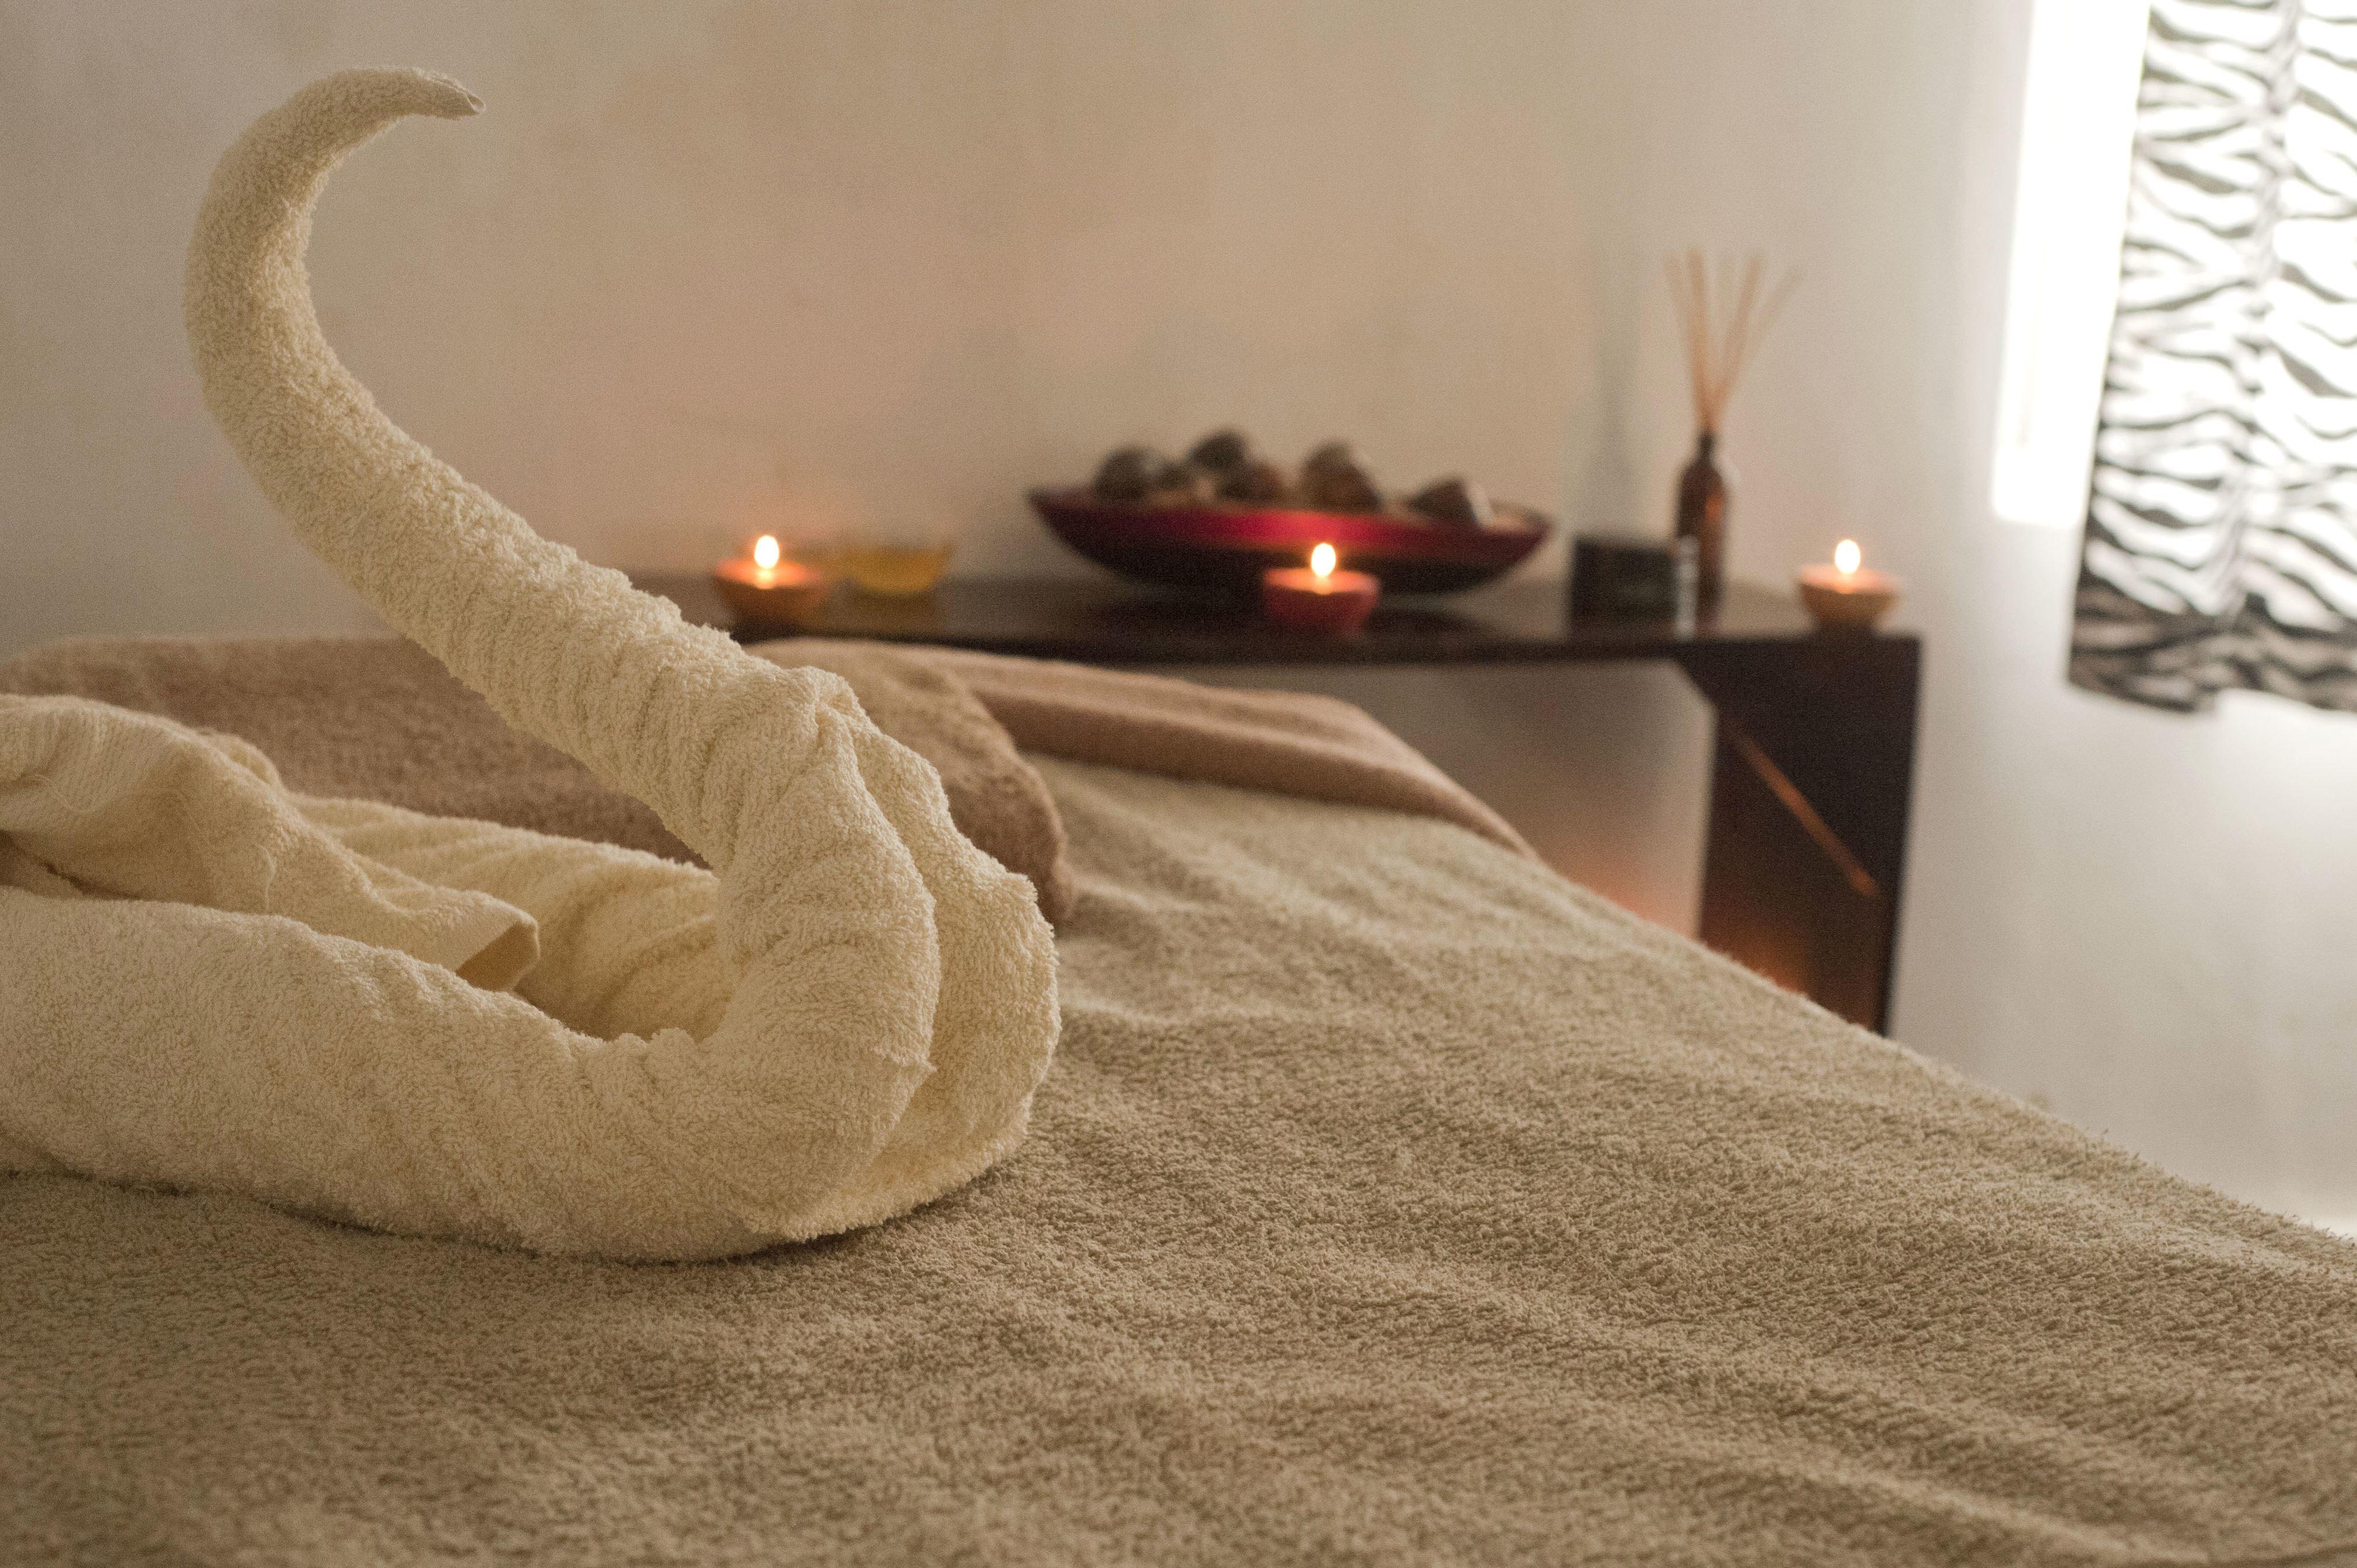 Decke, Kerzen, Bett, Schlafzimmer, Zimmer, Handtuch